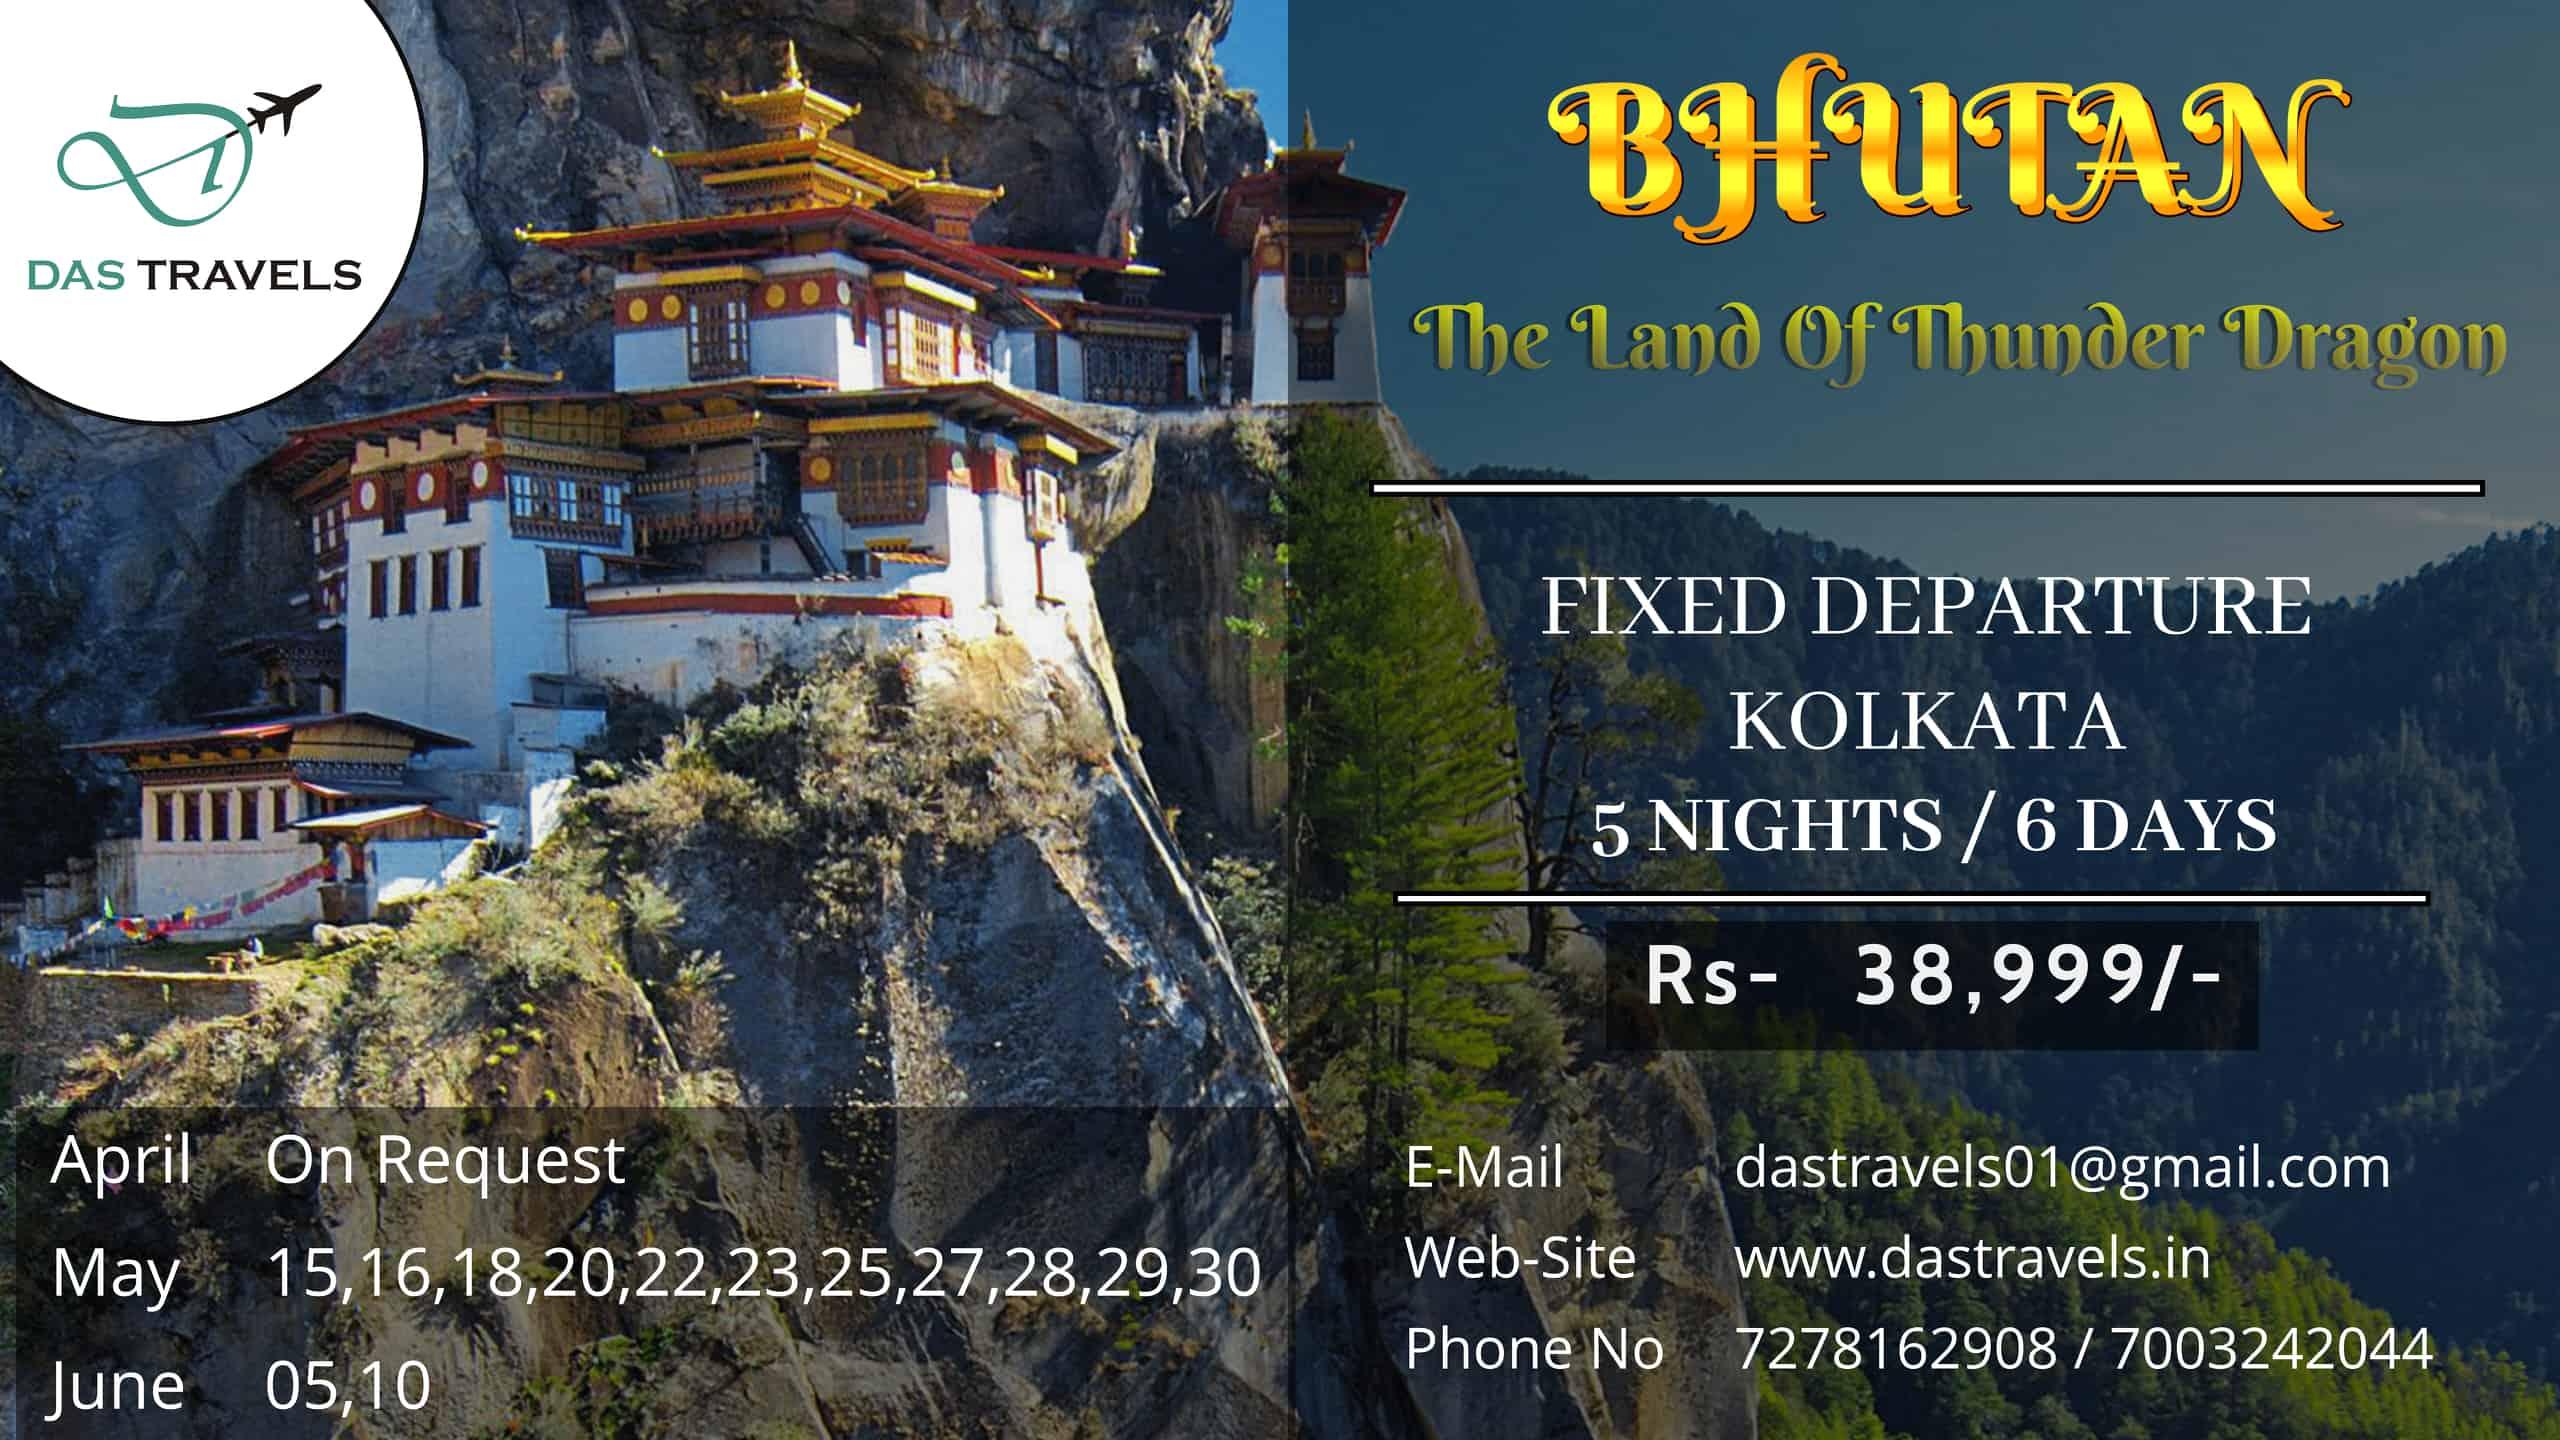 Bhutan 5 Nights 6 Days Summer Fixed Departure From Kolkata